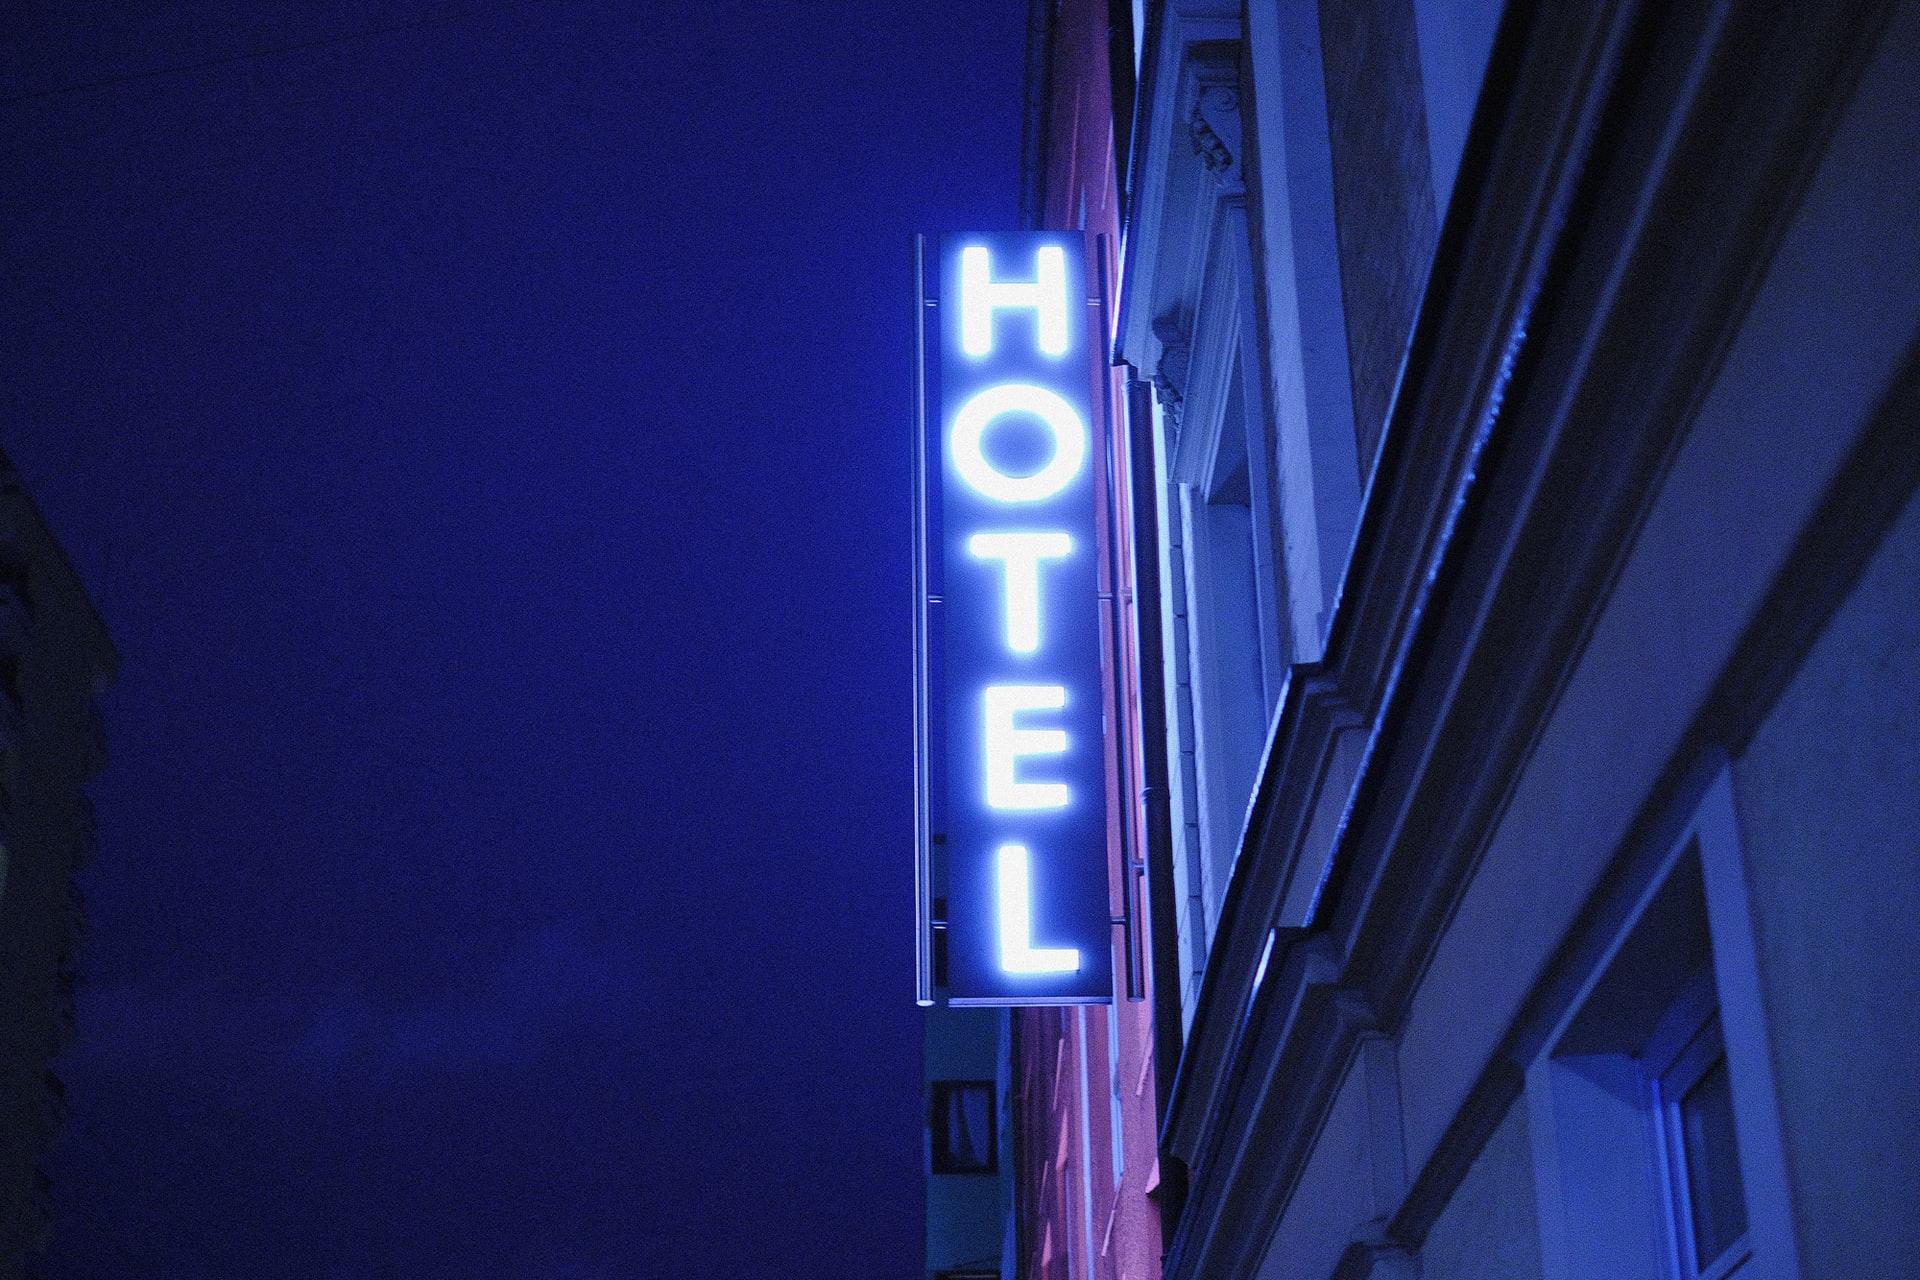 achat hôtel